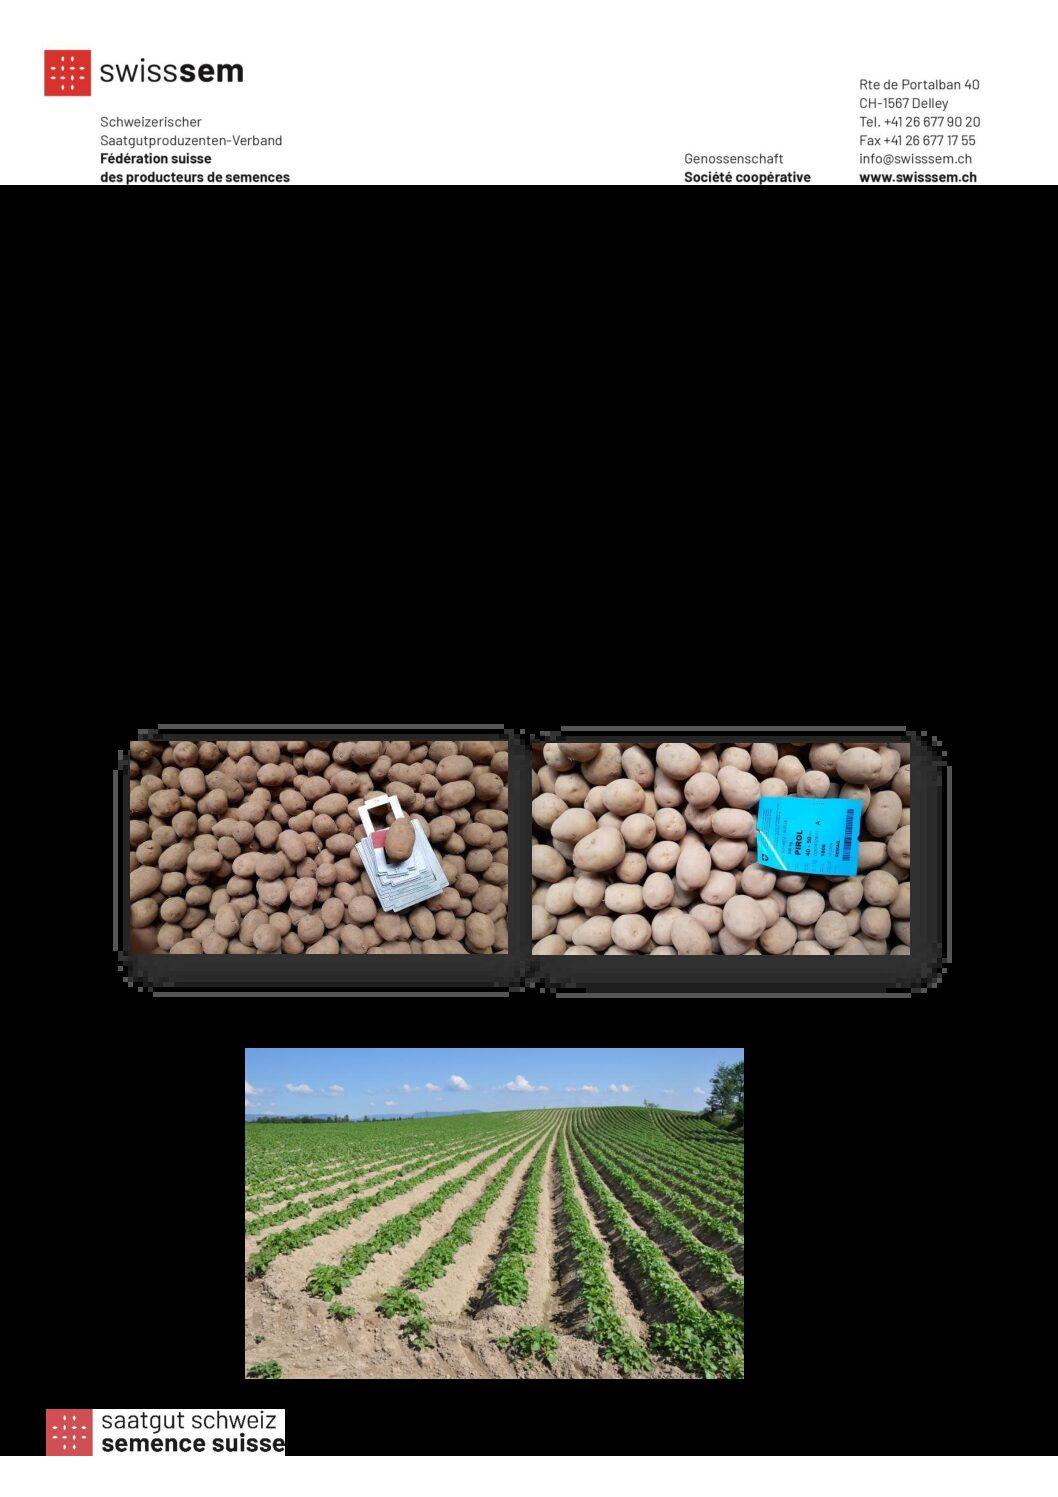 20 RAP V-4 200914 communication presse agricole f